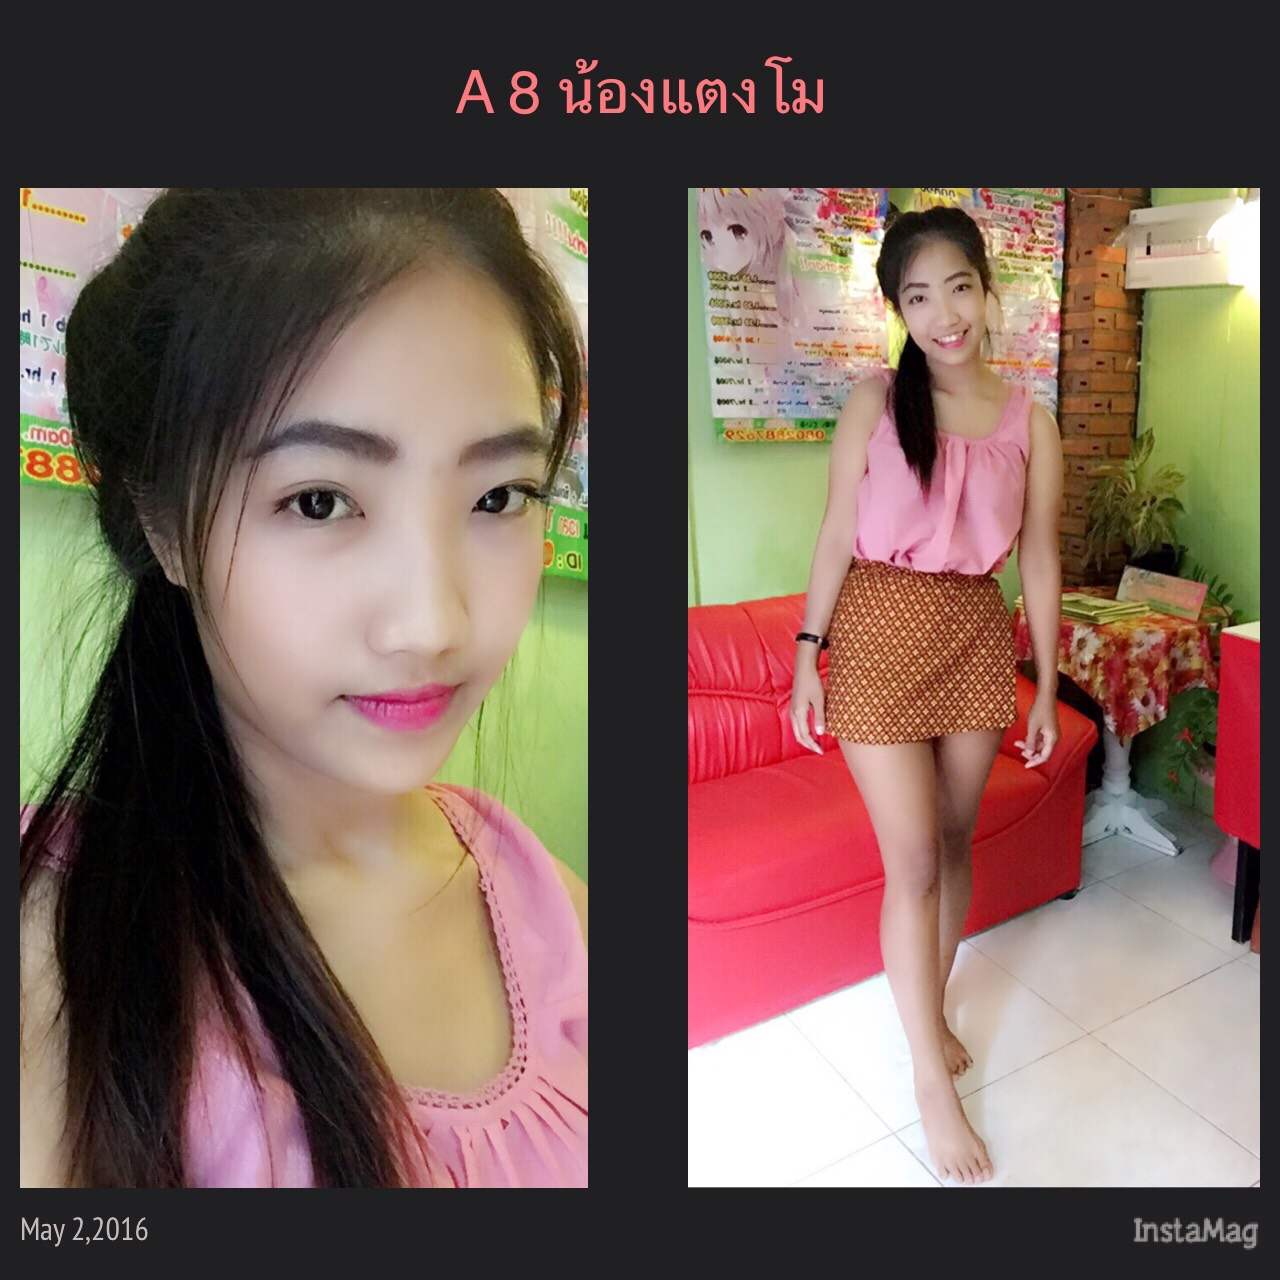 Asian massage locator